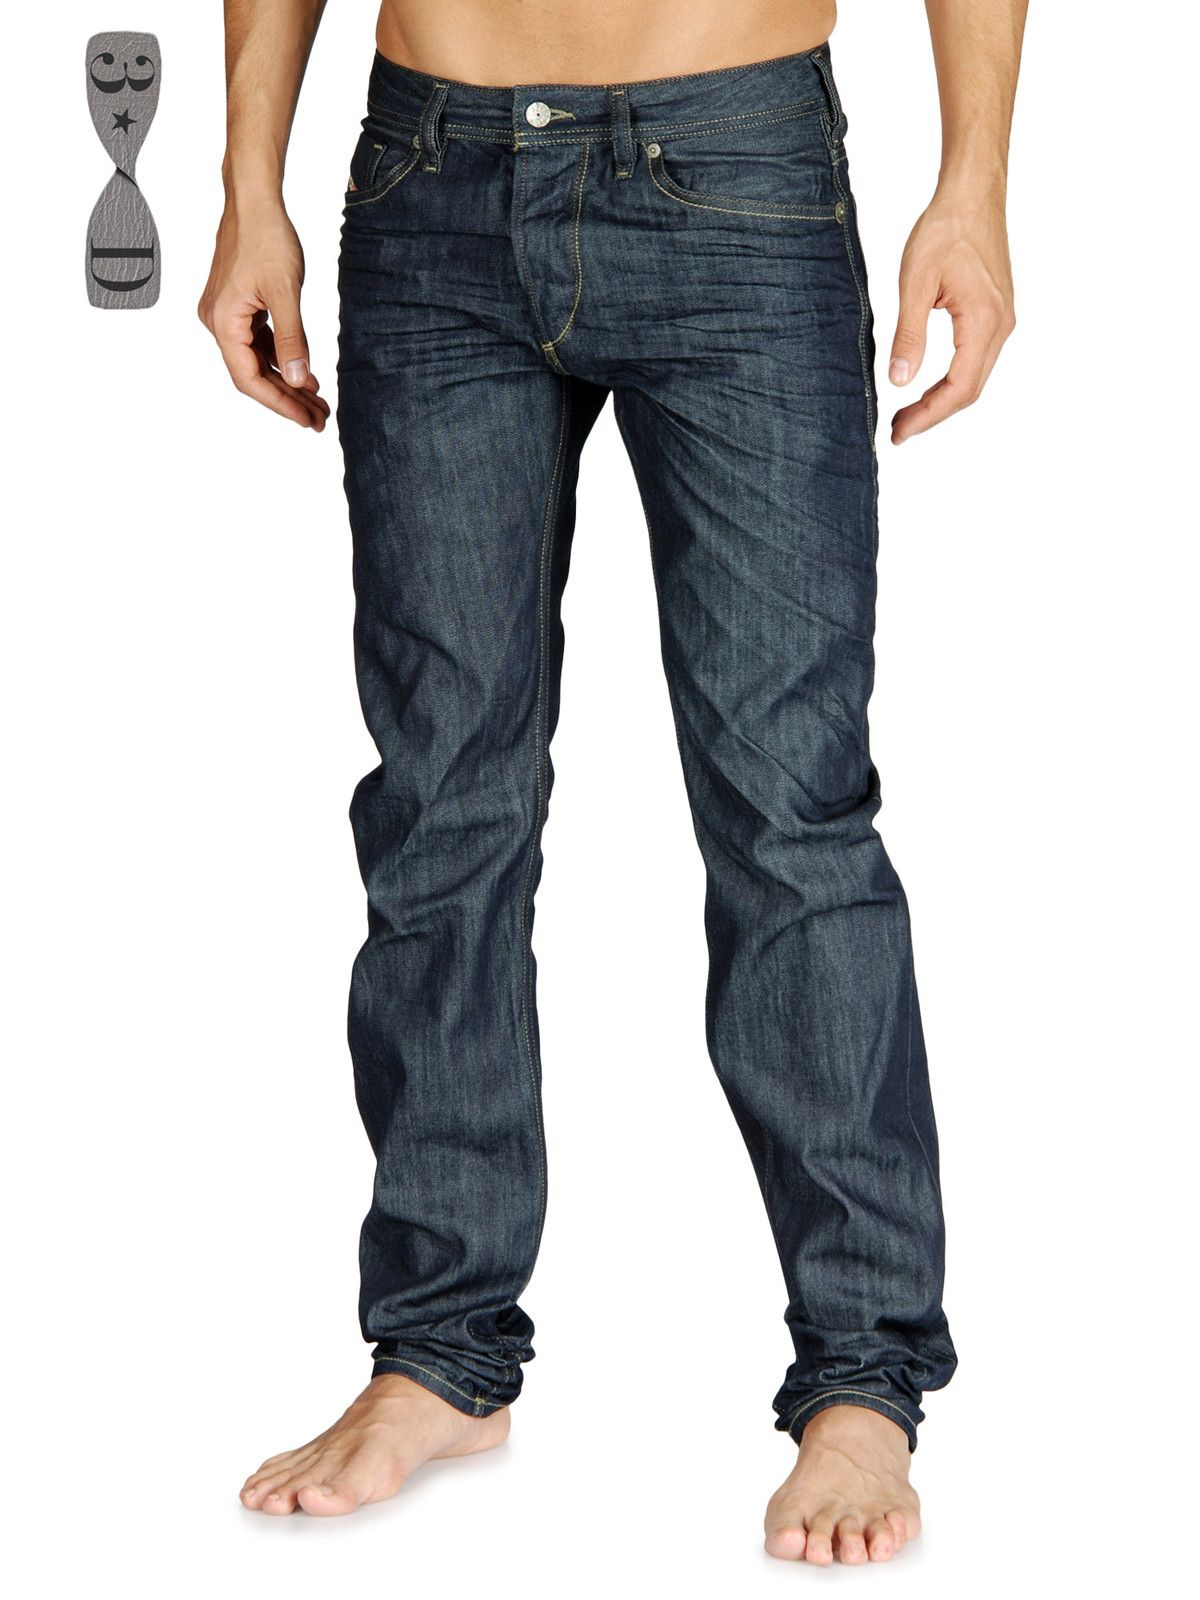 Diesel - Koolter (con imágenes) | Pants, Hombres, Pantalones